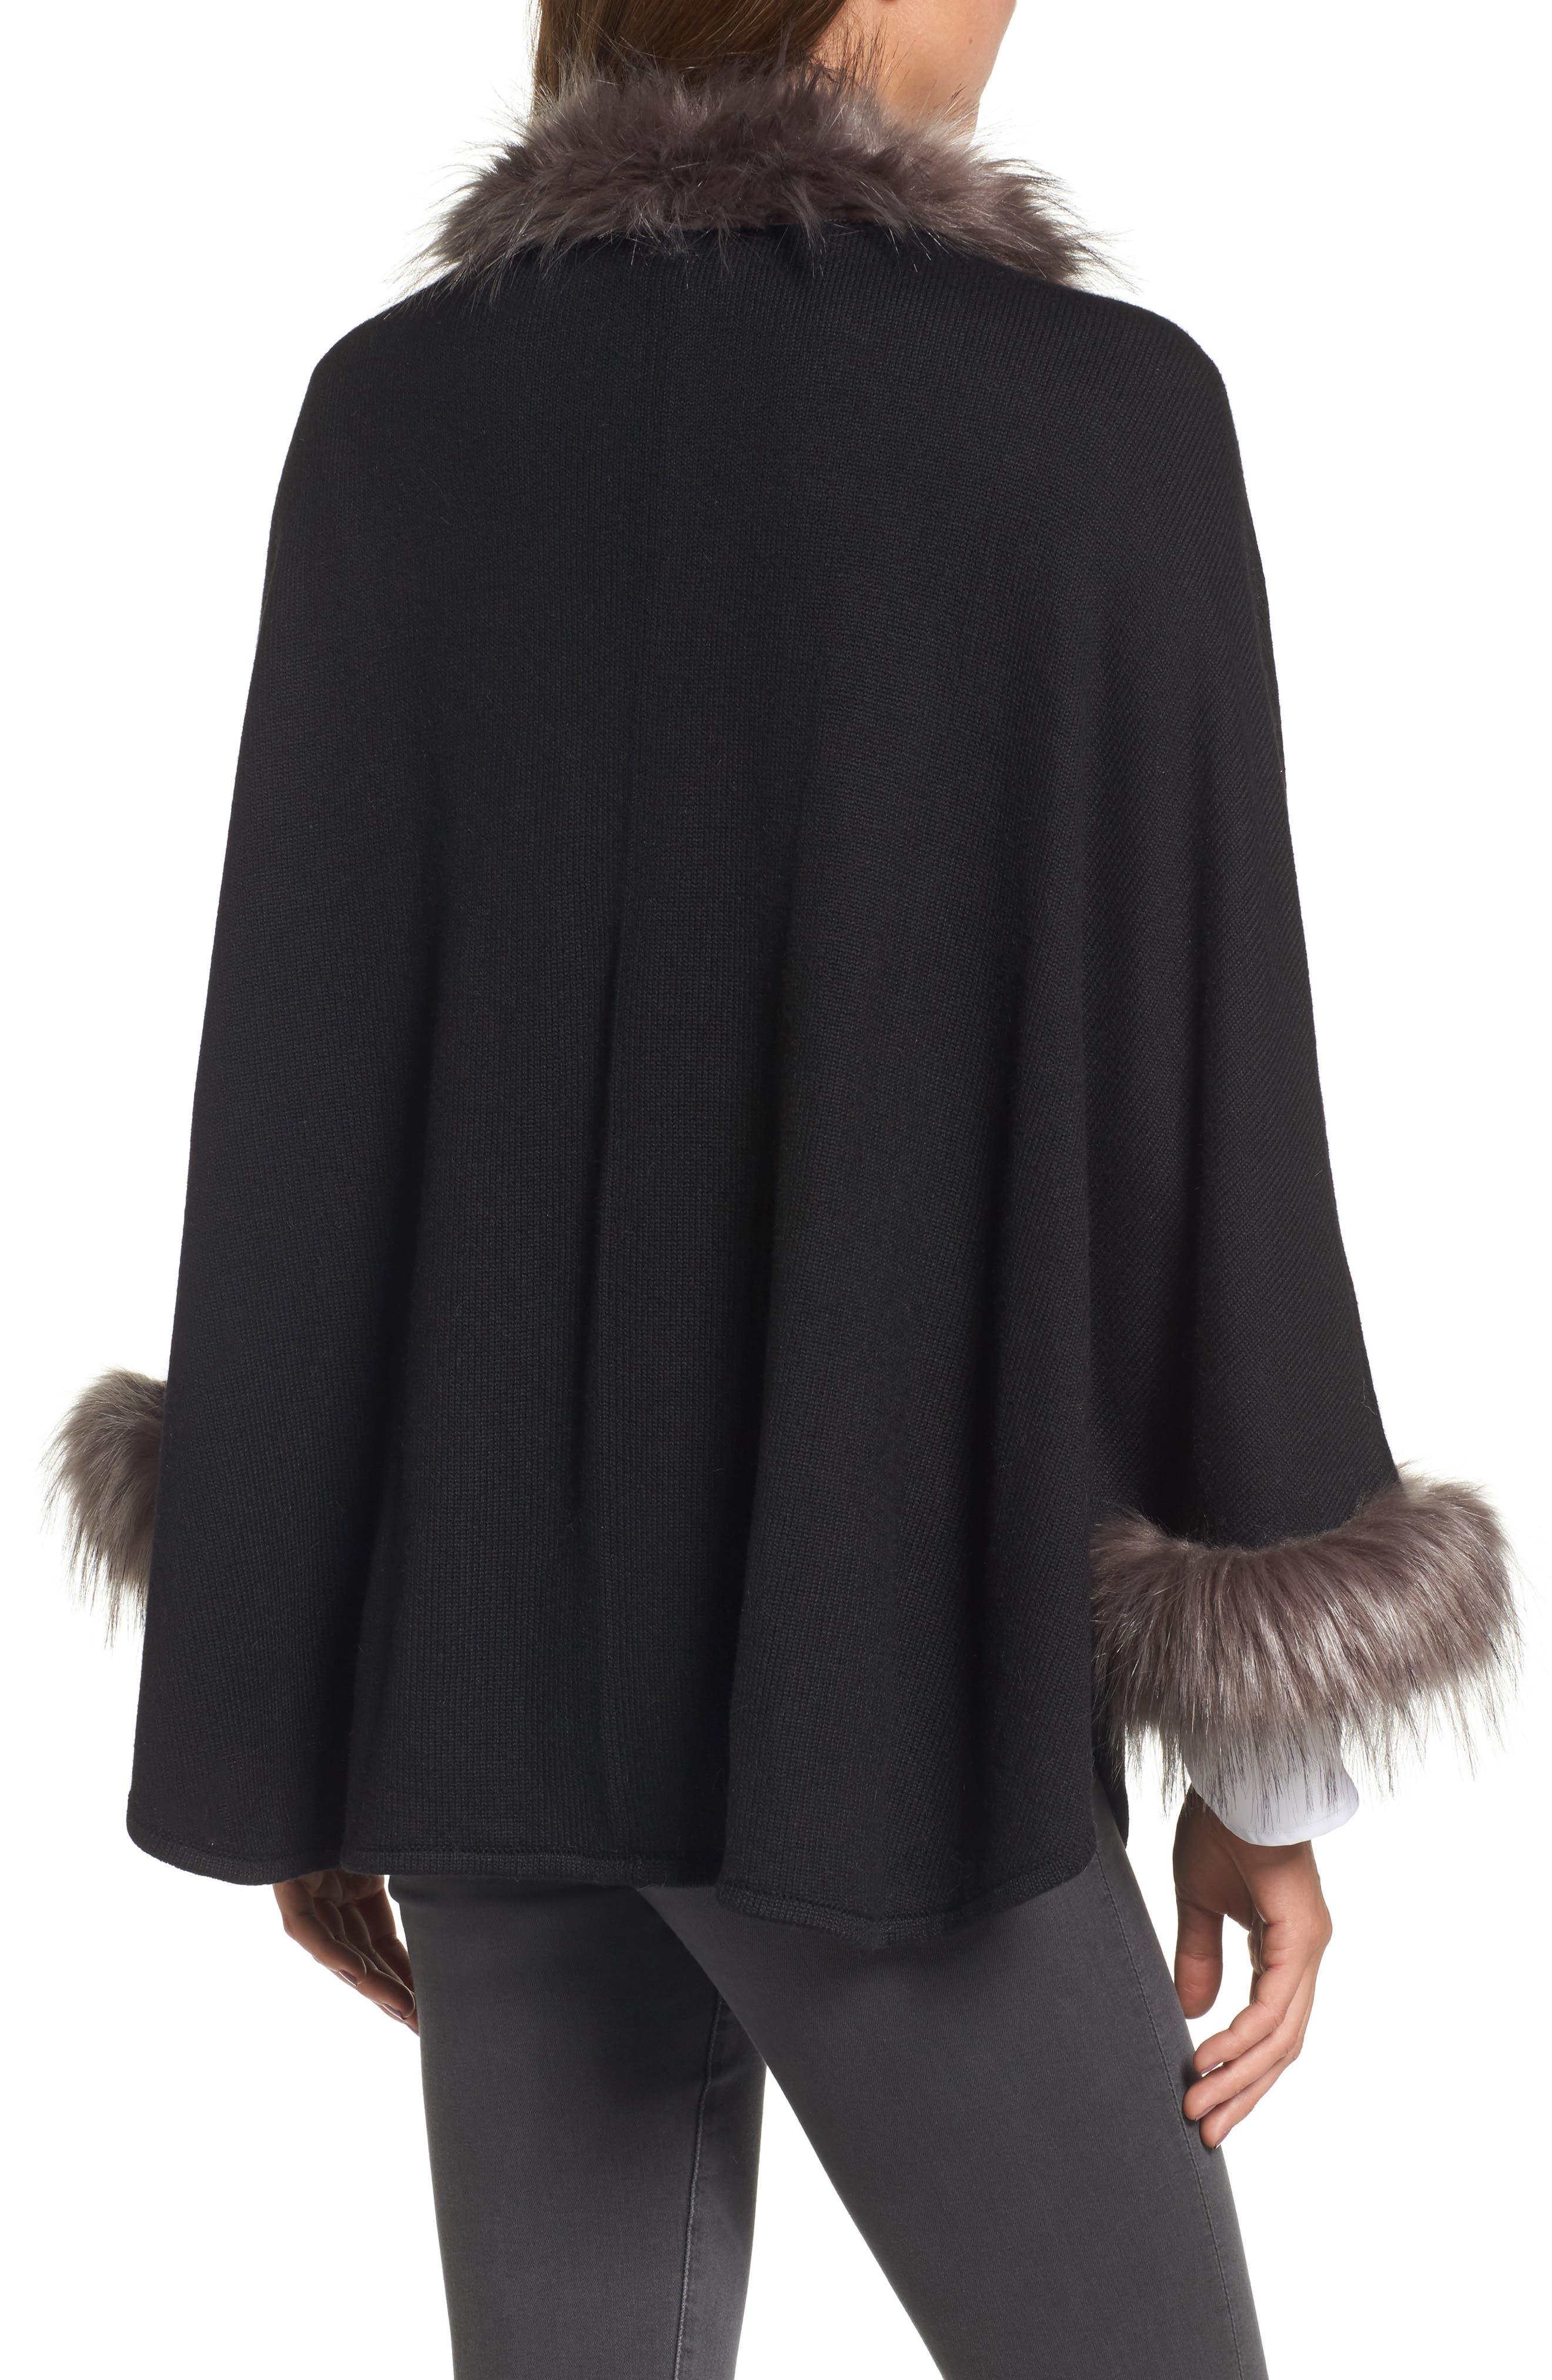 Knit Poncho with Faux Fur Trim,                             Alternate thumbnail 2, color,                             001